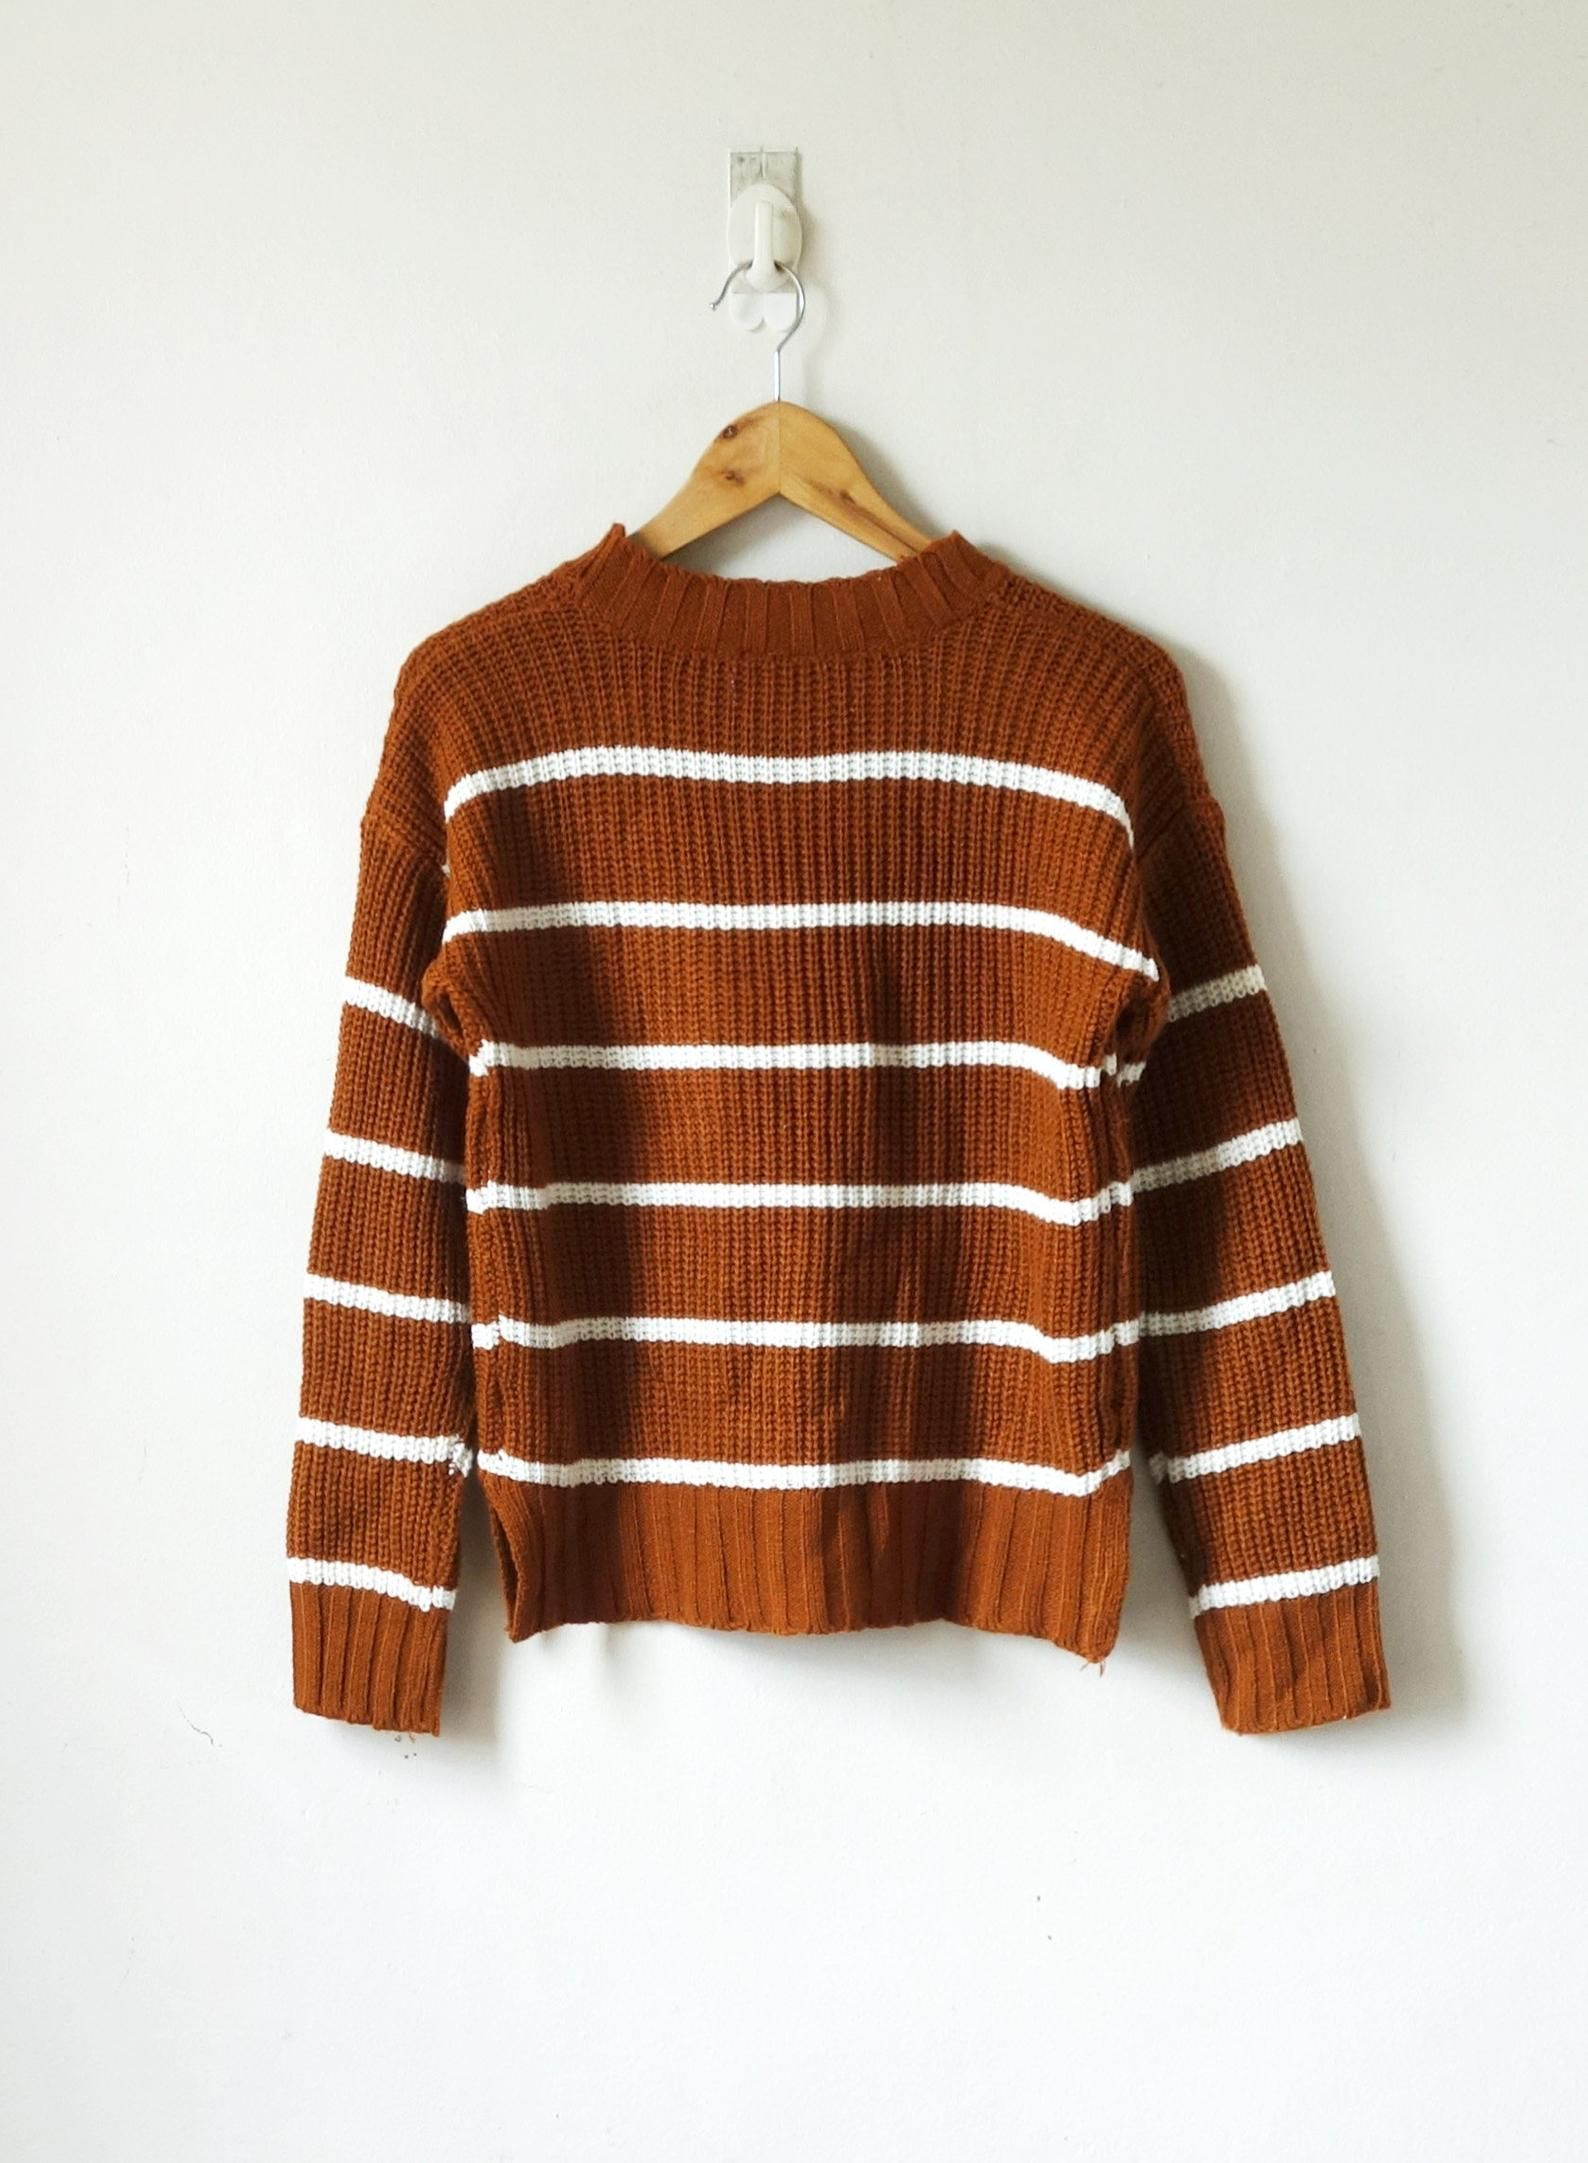 90s Burnt Orange Striped Sweater With Pocket 90s Sweater Women S M Burnt Orange Sweater Sweaters Orange T Shirts [ 2163 x 1588 Pixel ]